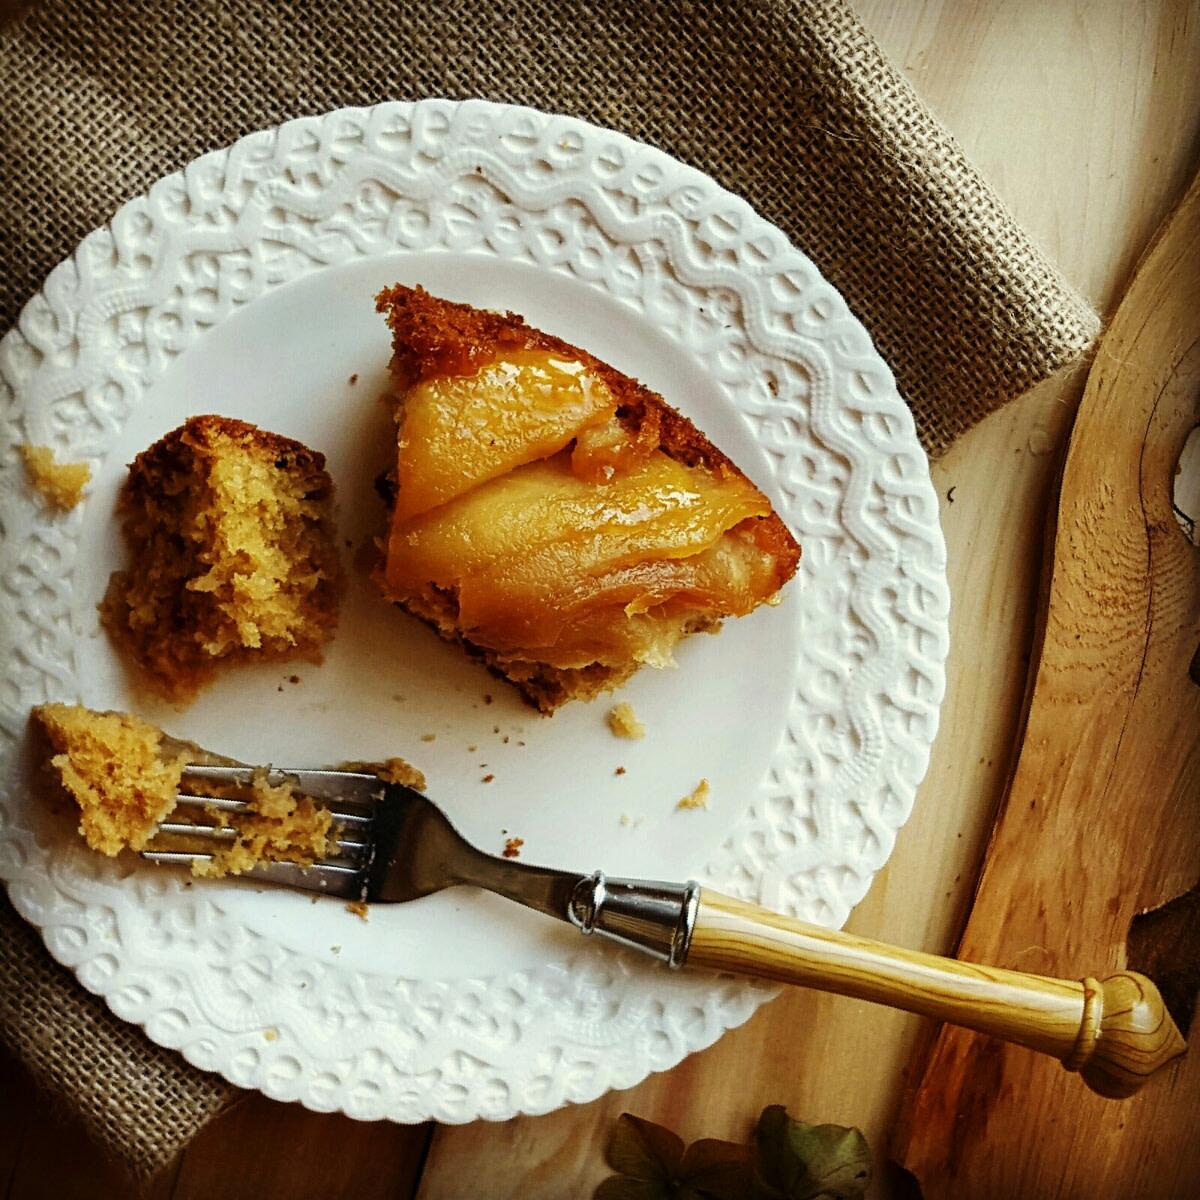 Maple apple tart slice